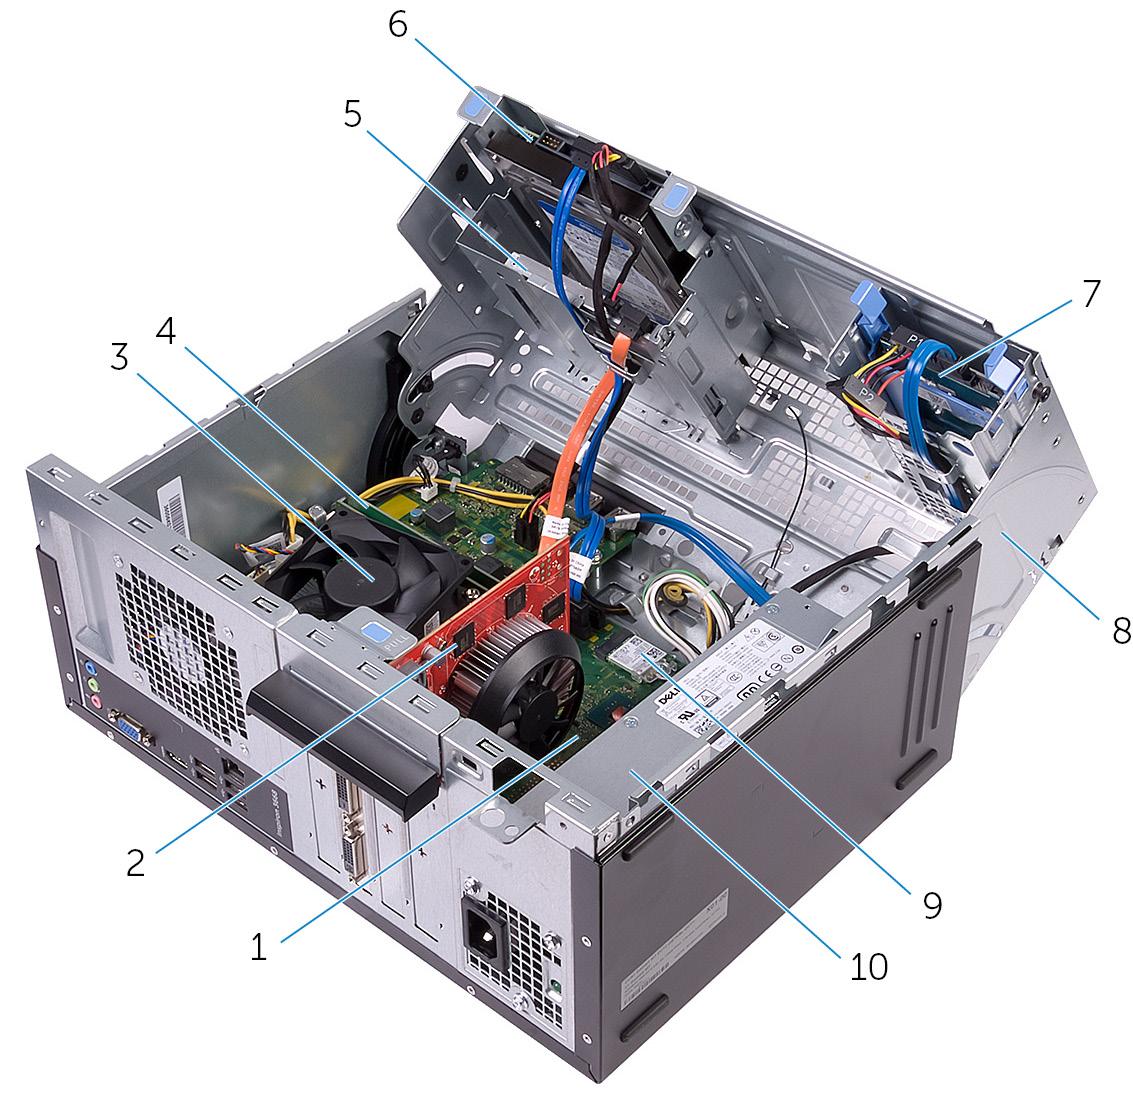 [WLLP_2054]   Inspiron 3668 Service Manual | Dell Computer Wiring Diagram |  | Inspiron 3668 Service Manual